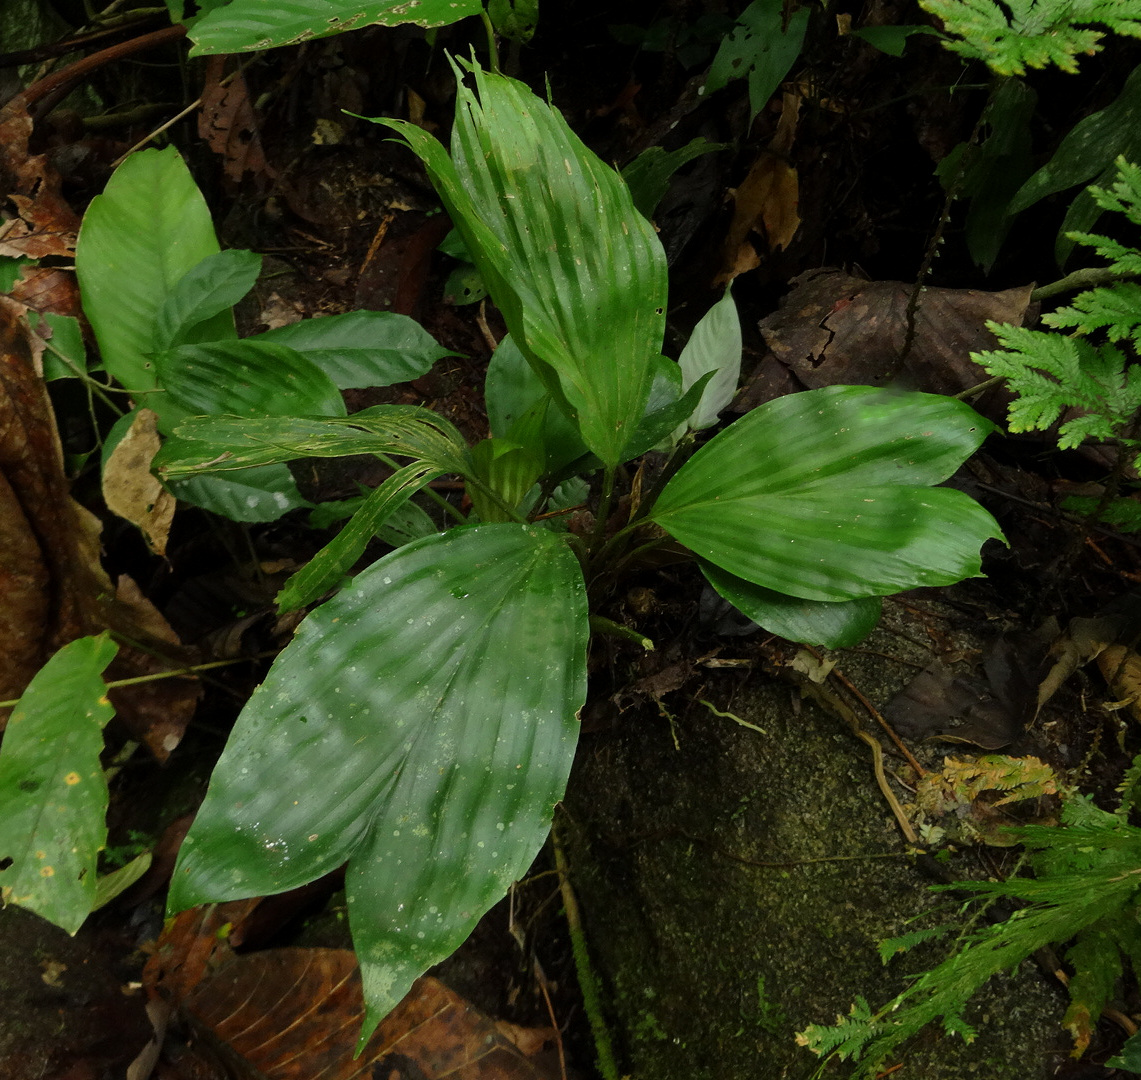 Dicranopygium cf. cuatrecasasianum , lowland rainforest, western Panamá.